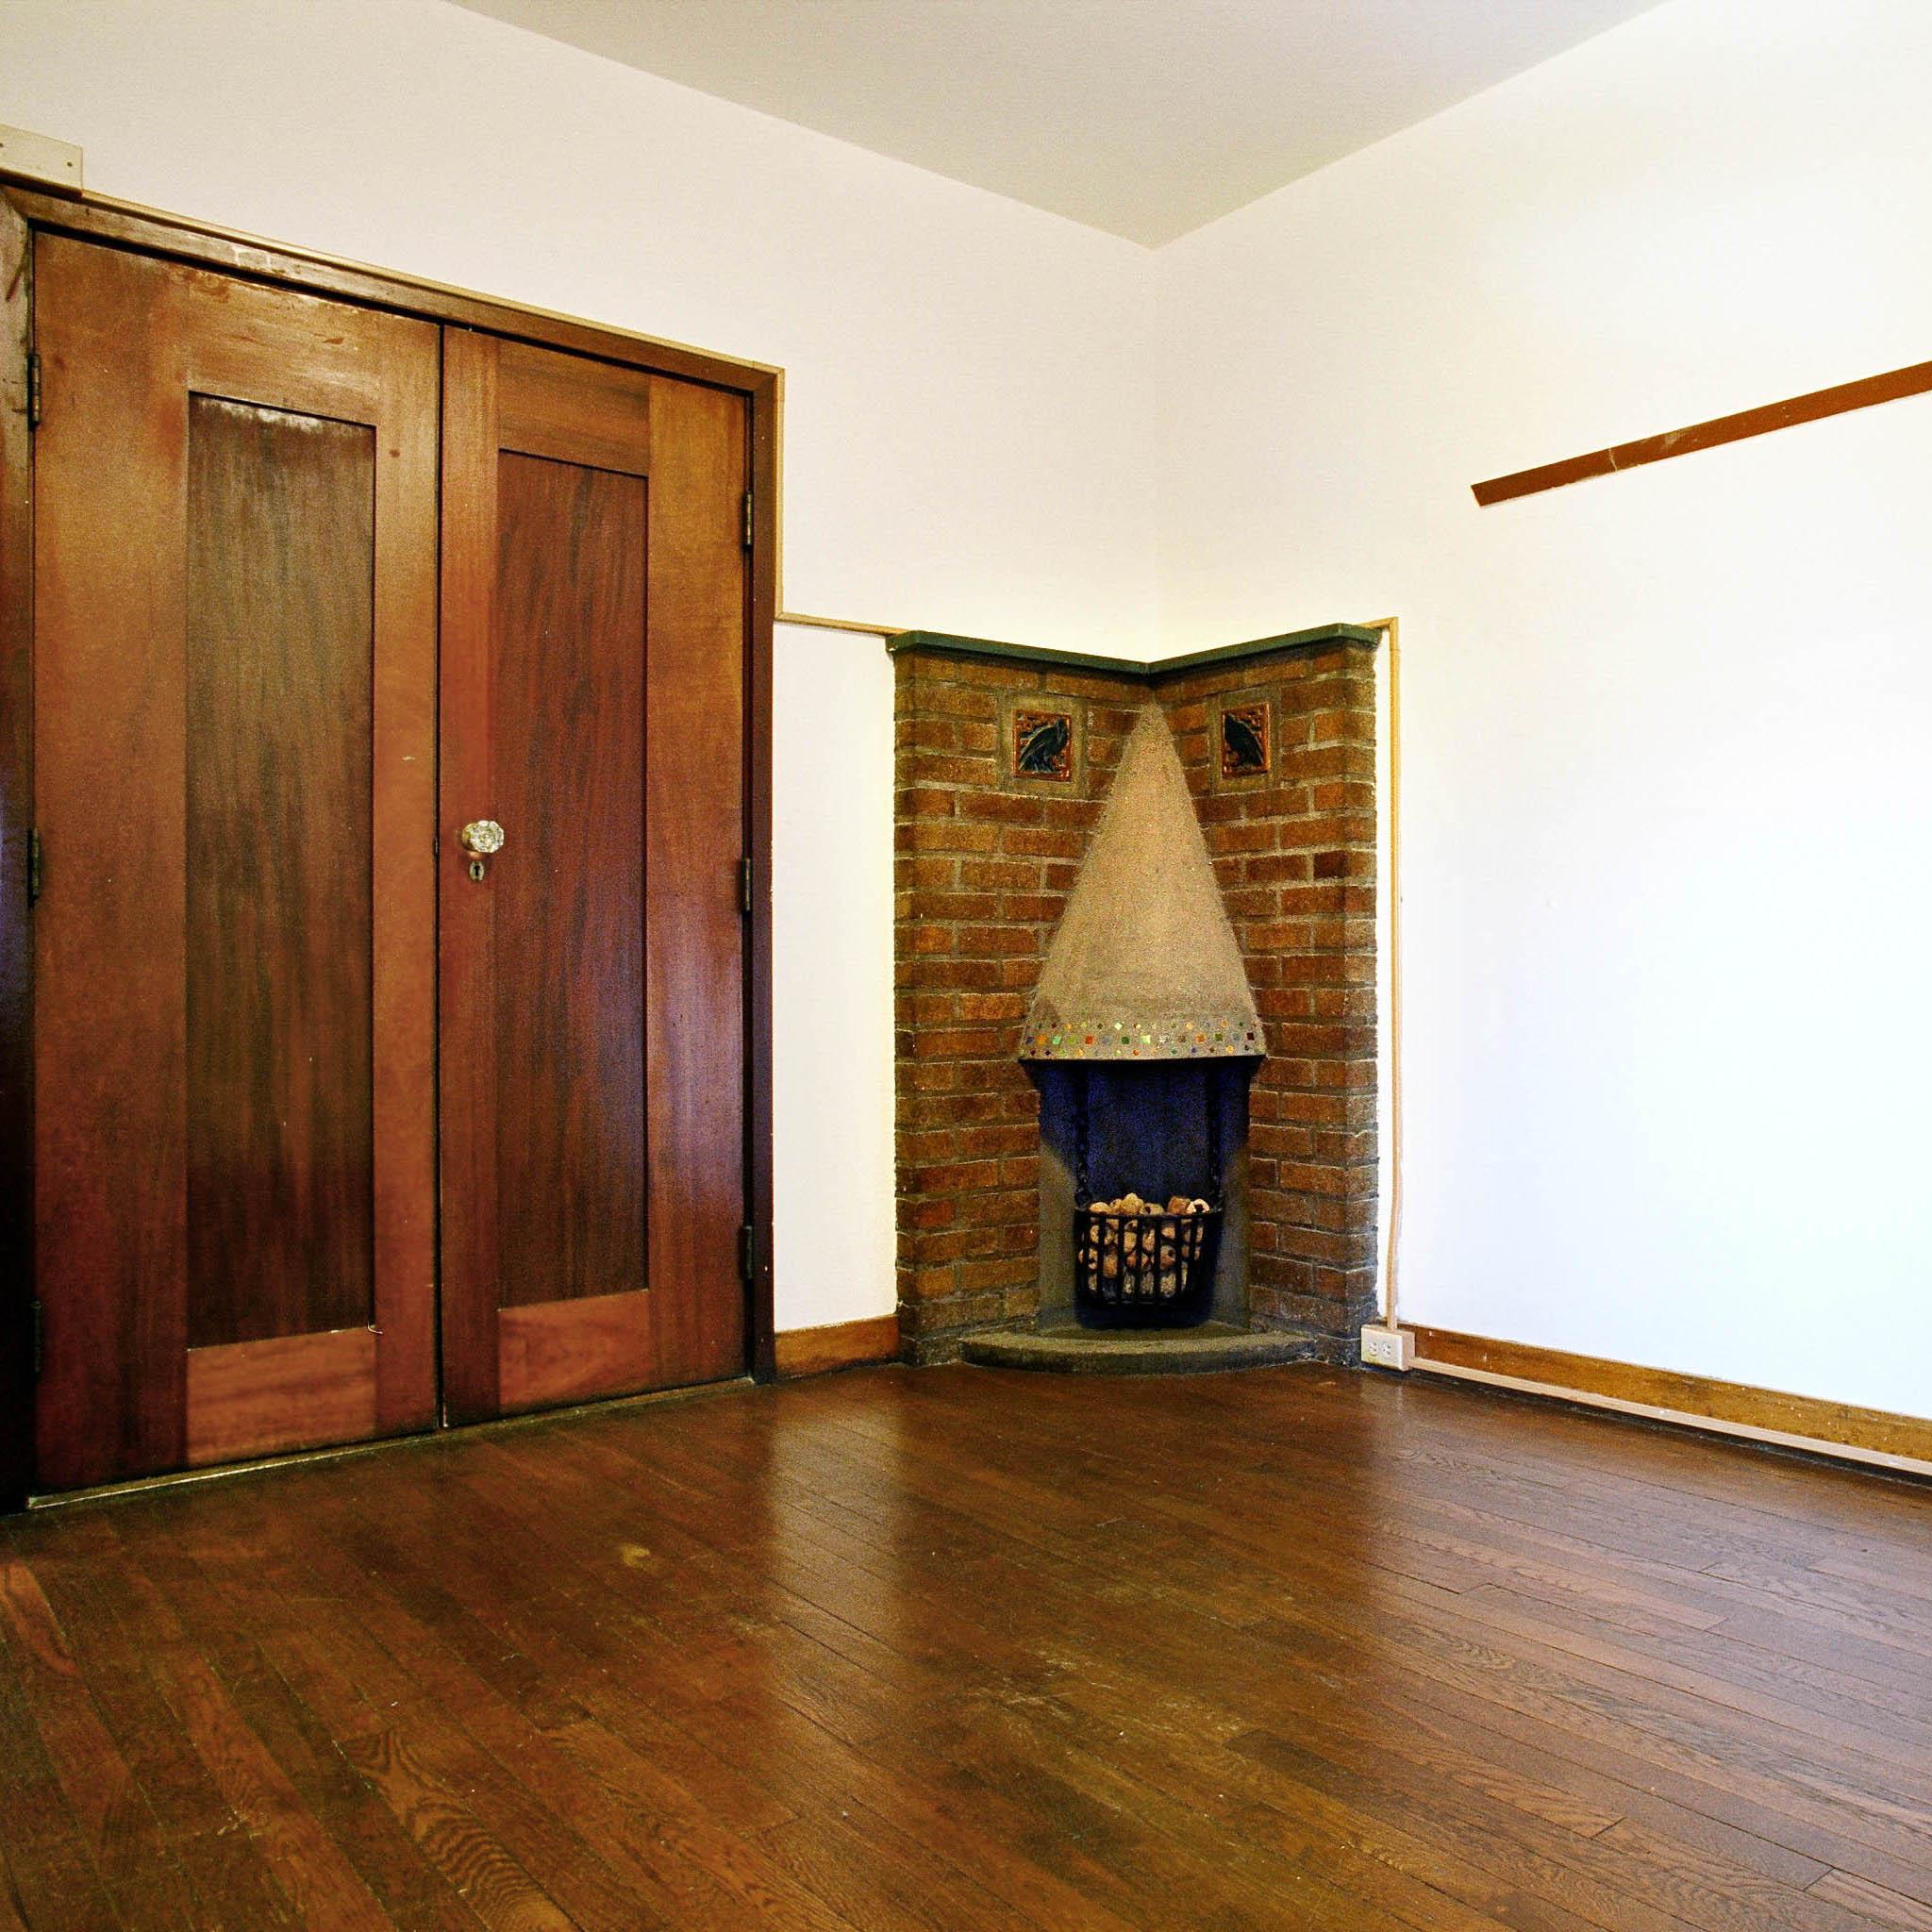 interior of 340 S. Highland Ave, Apt. 7B 1